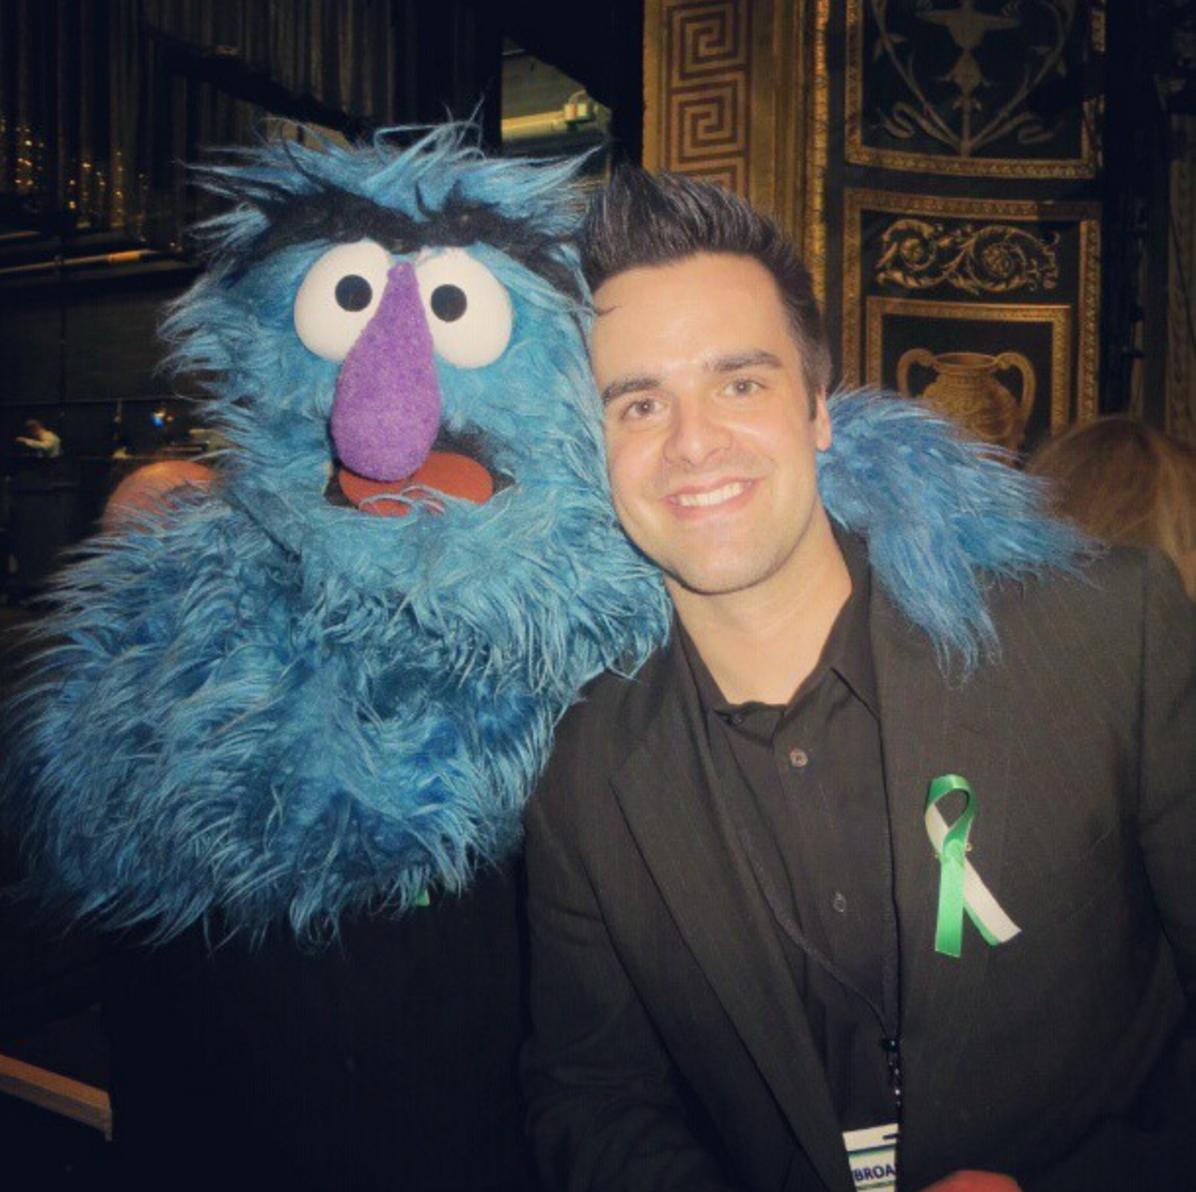 Michael J Moritz Jr with Cookie Monster!